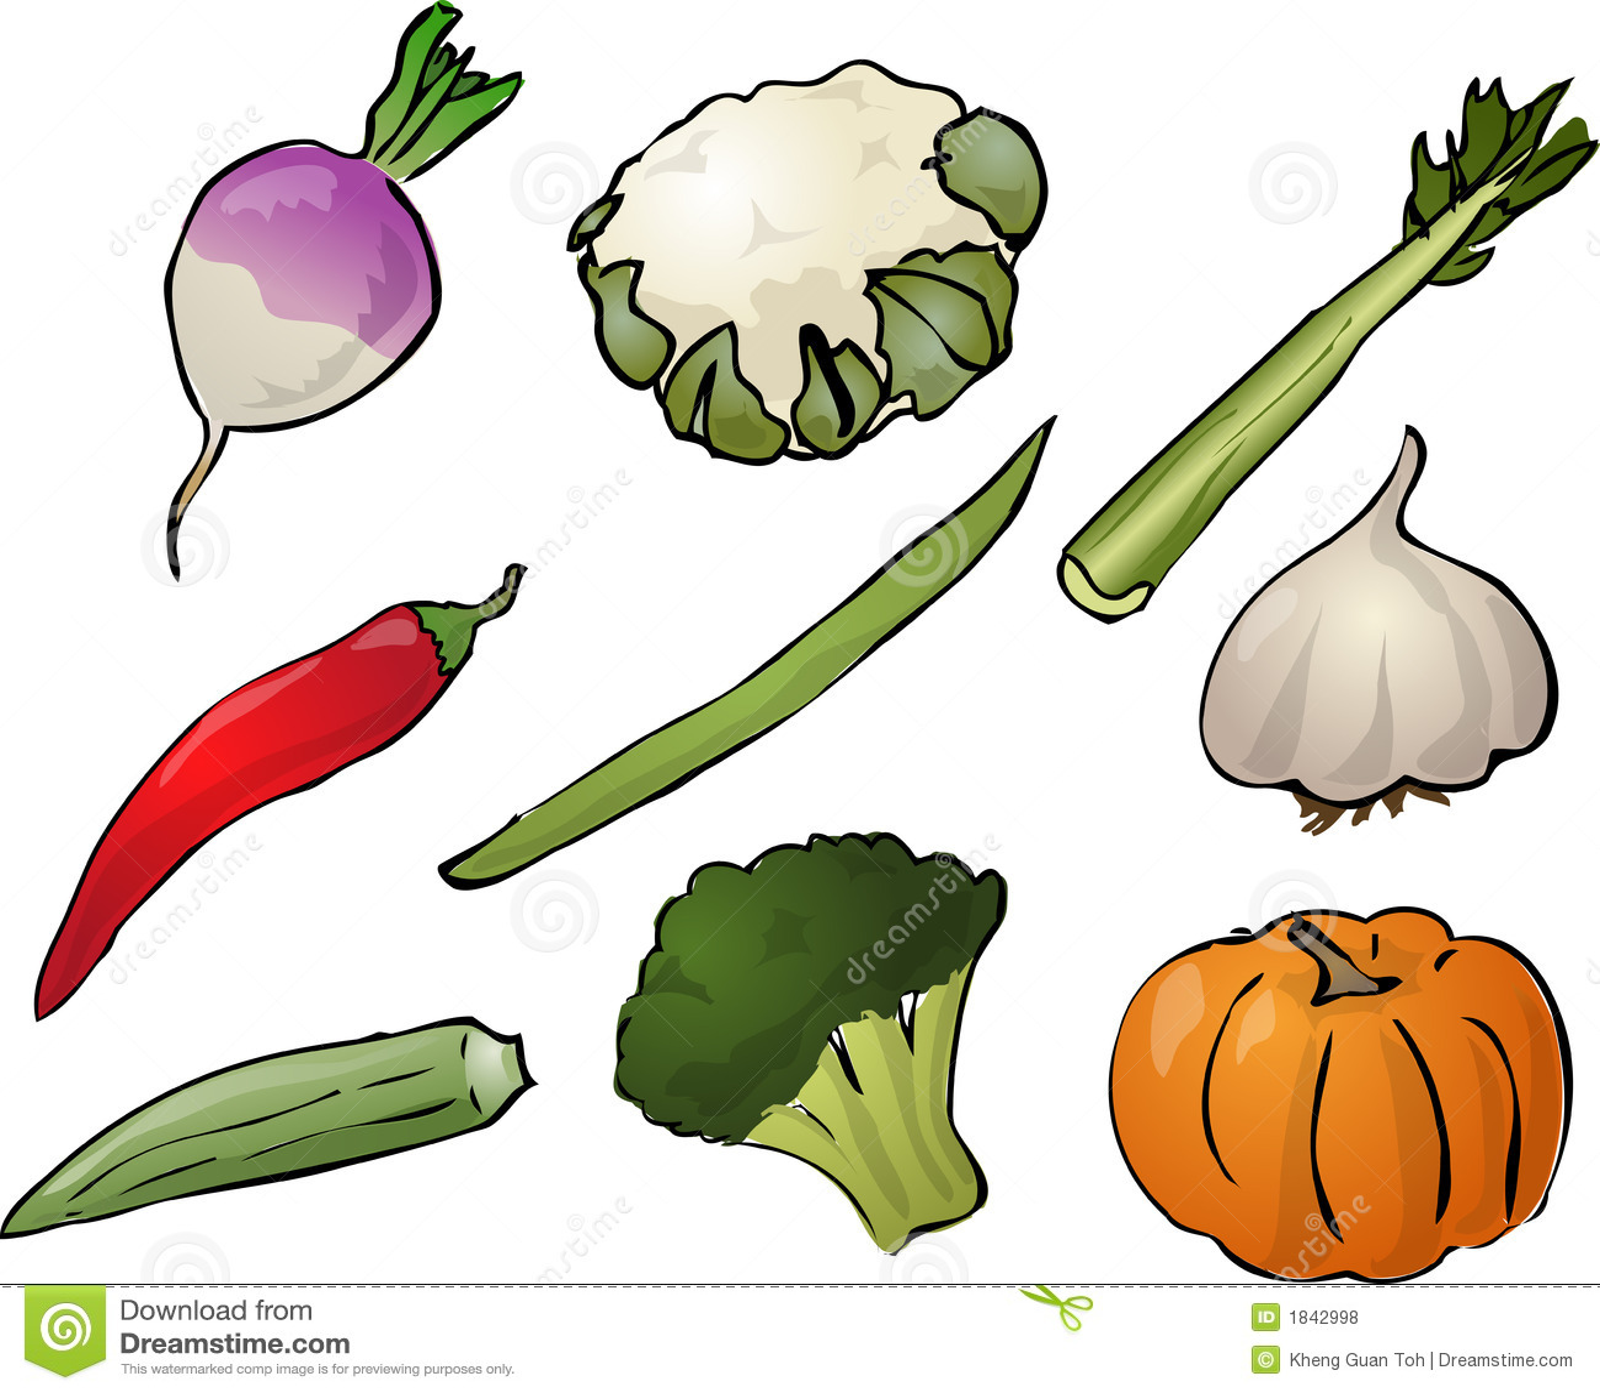 Vegetables illustration stock vector. Illustration of ...